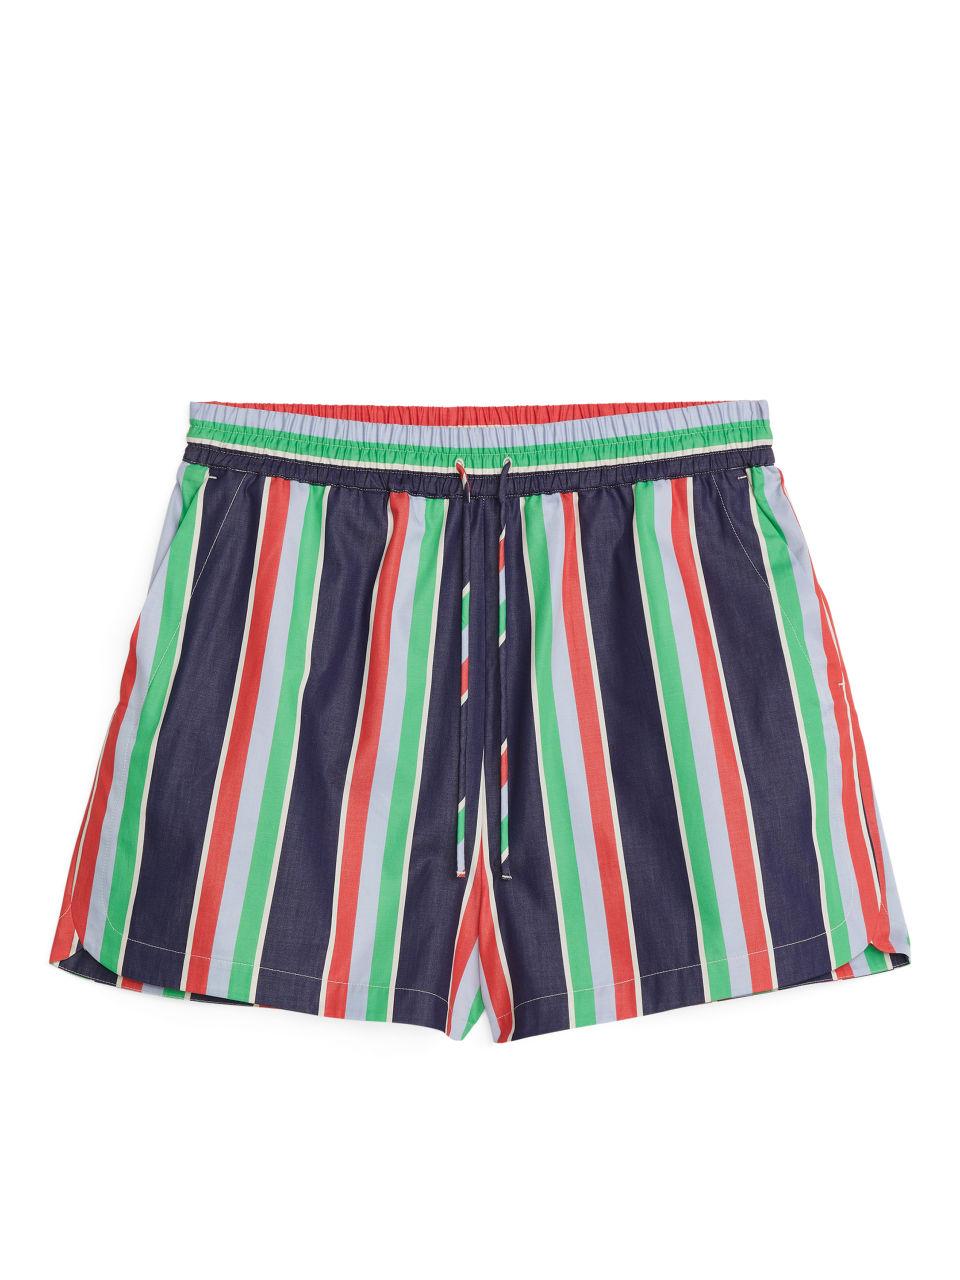 Cotton Poplin Shorts - Blue